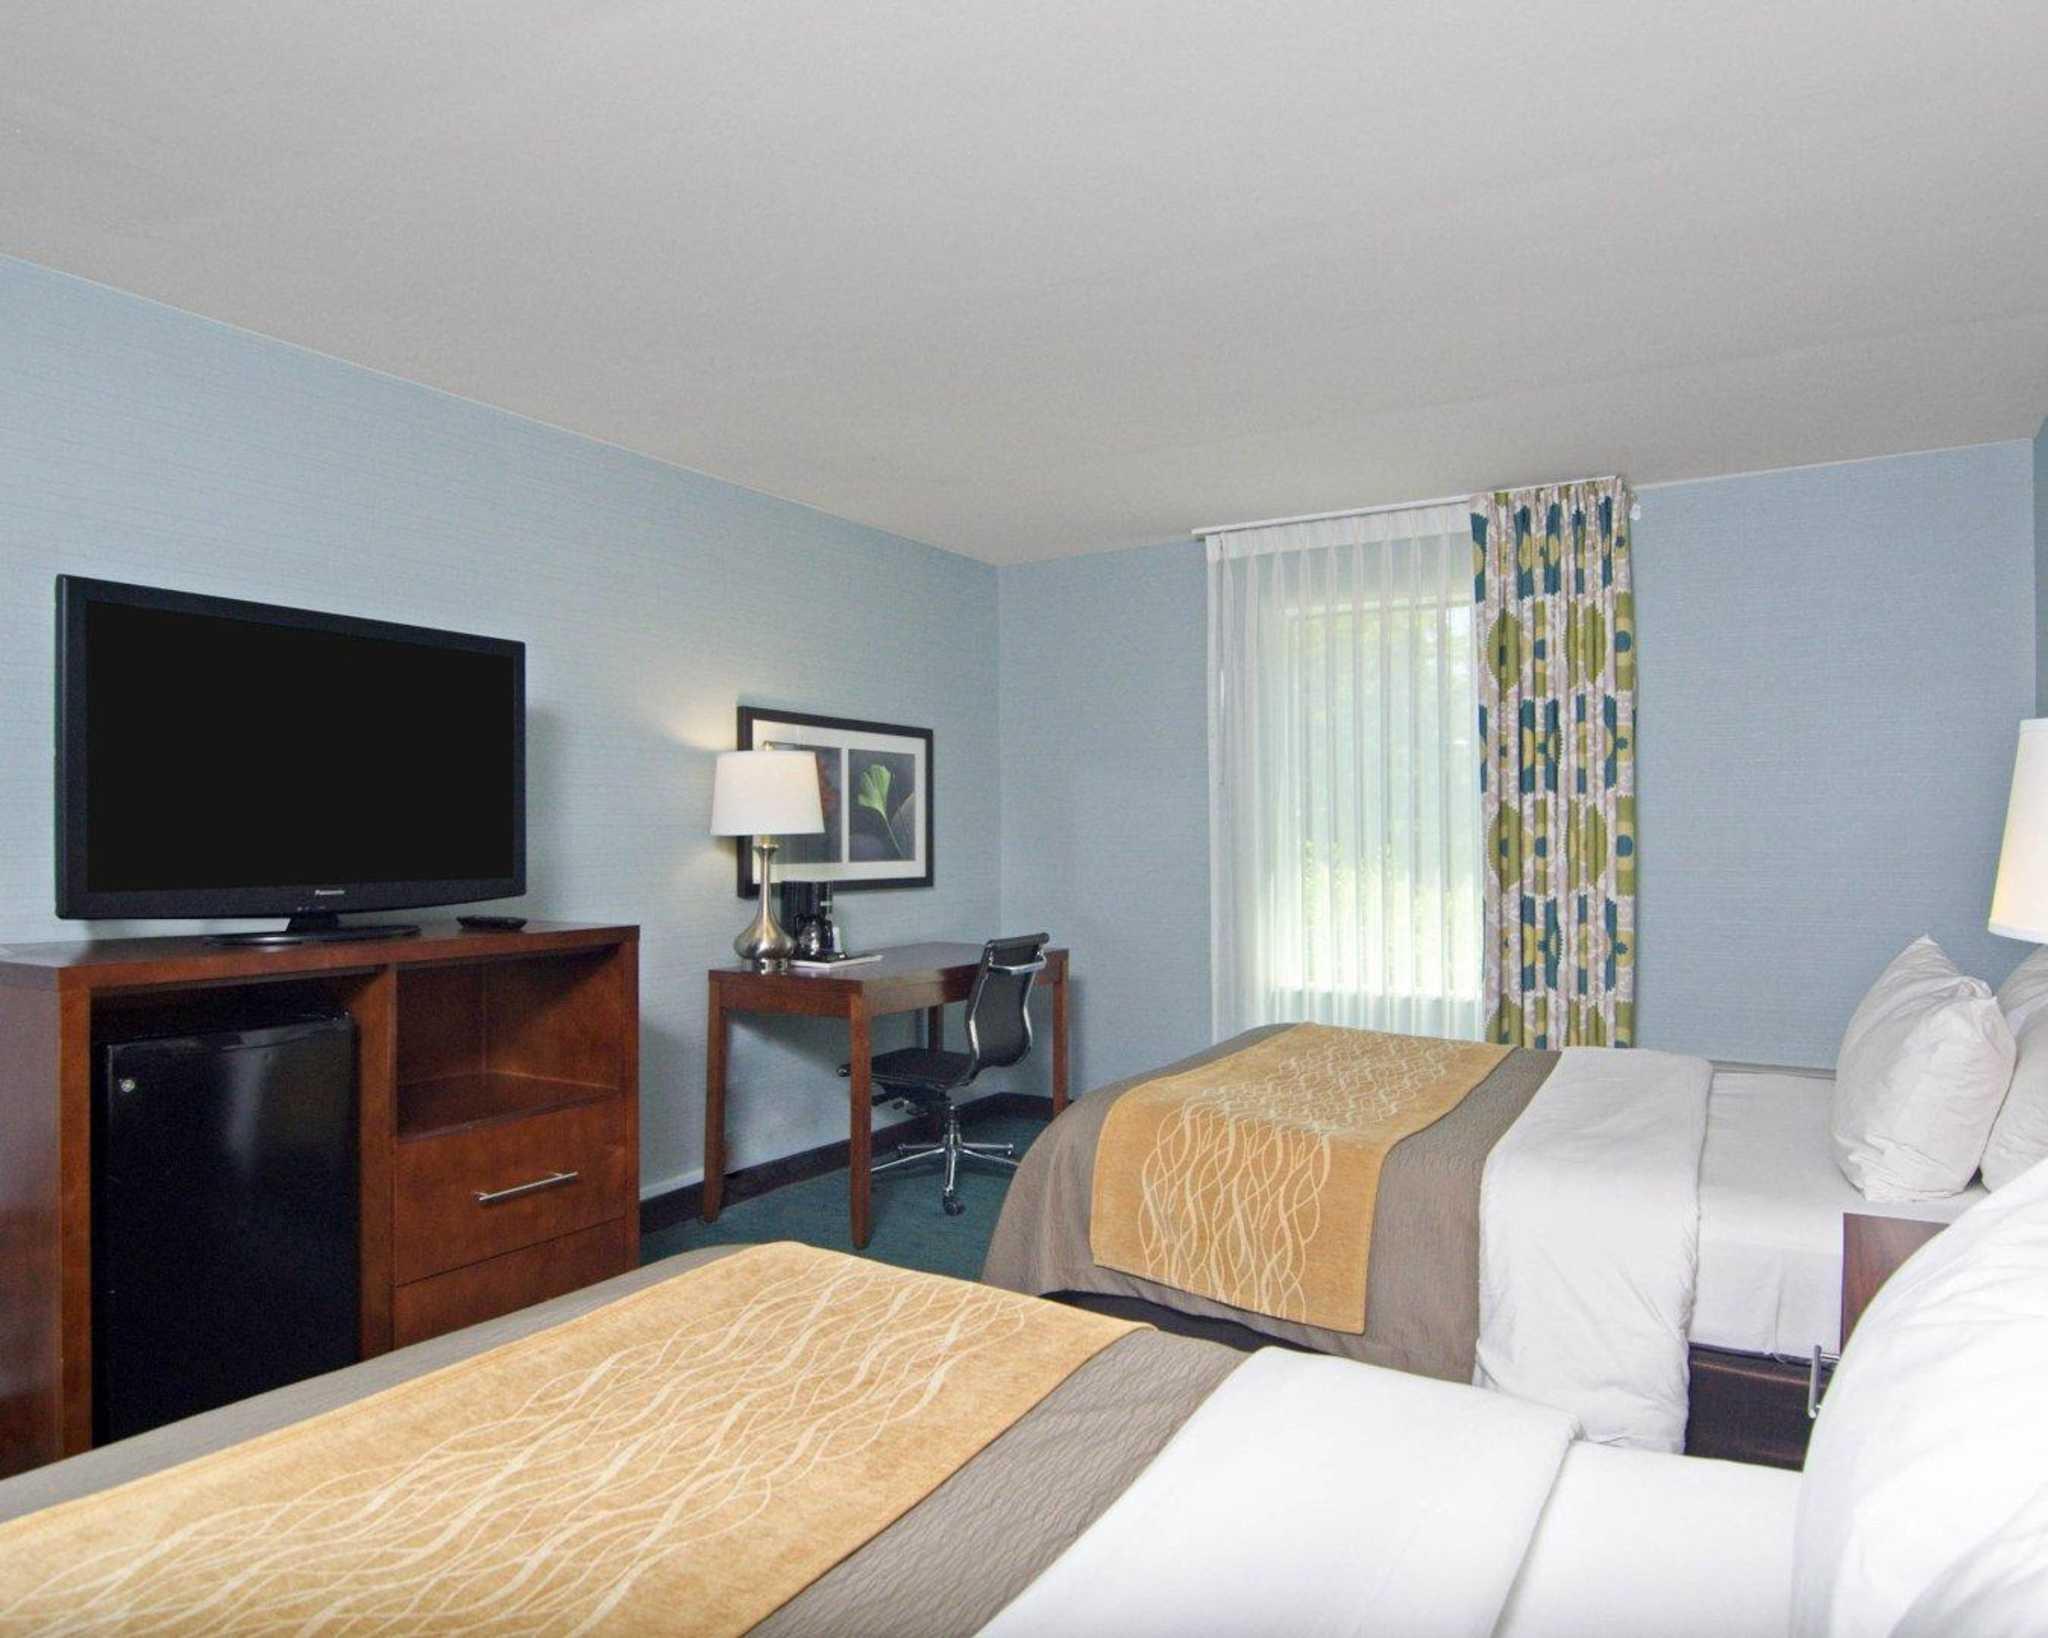 Comfort Inn Monticello image 8